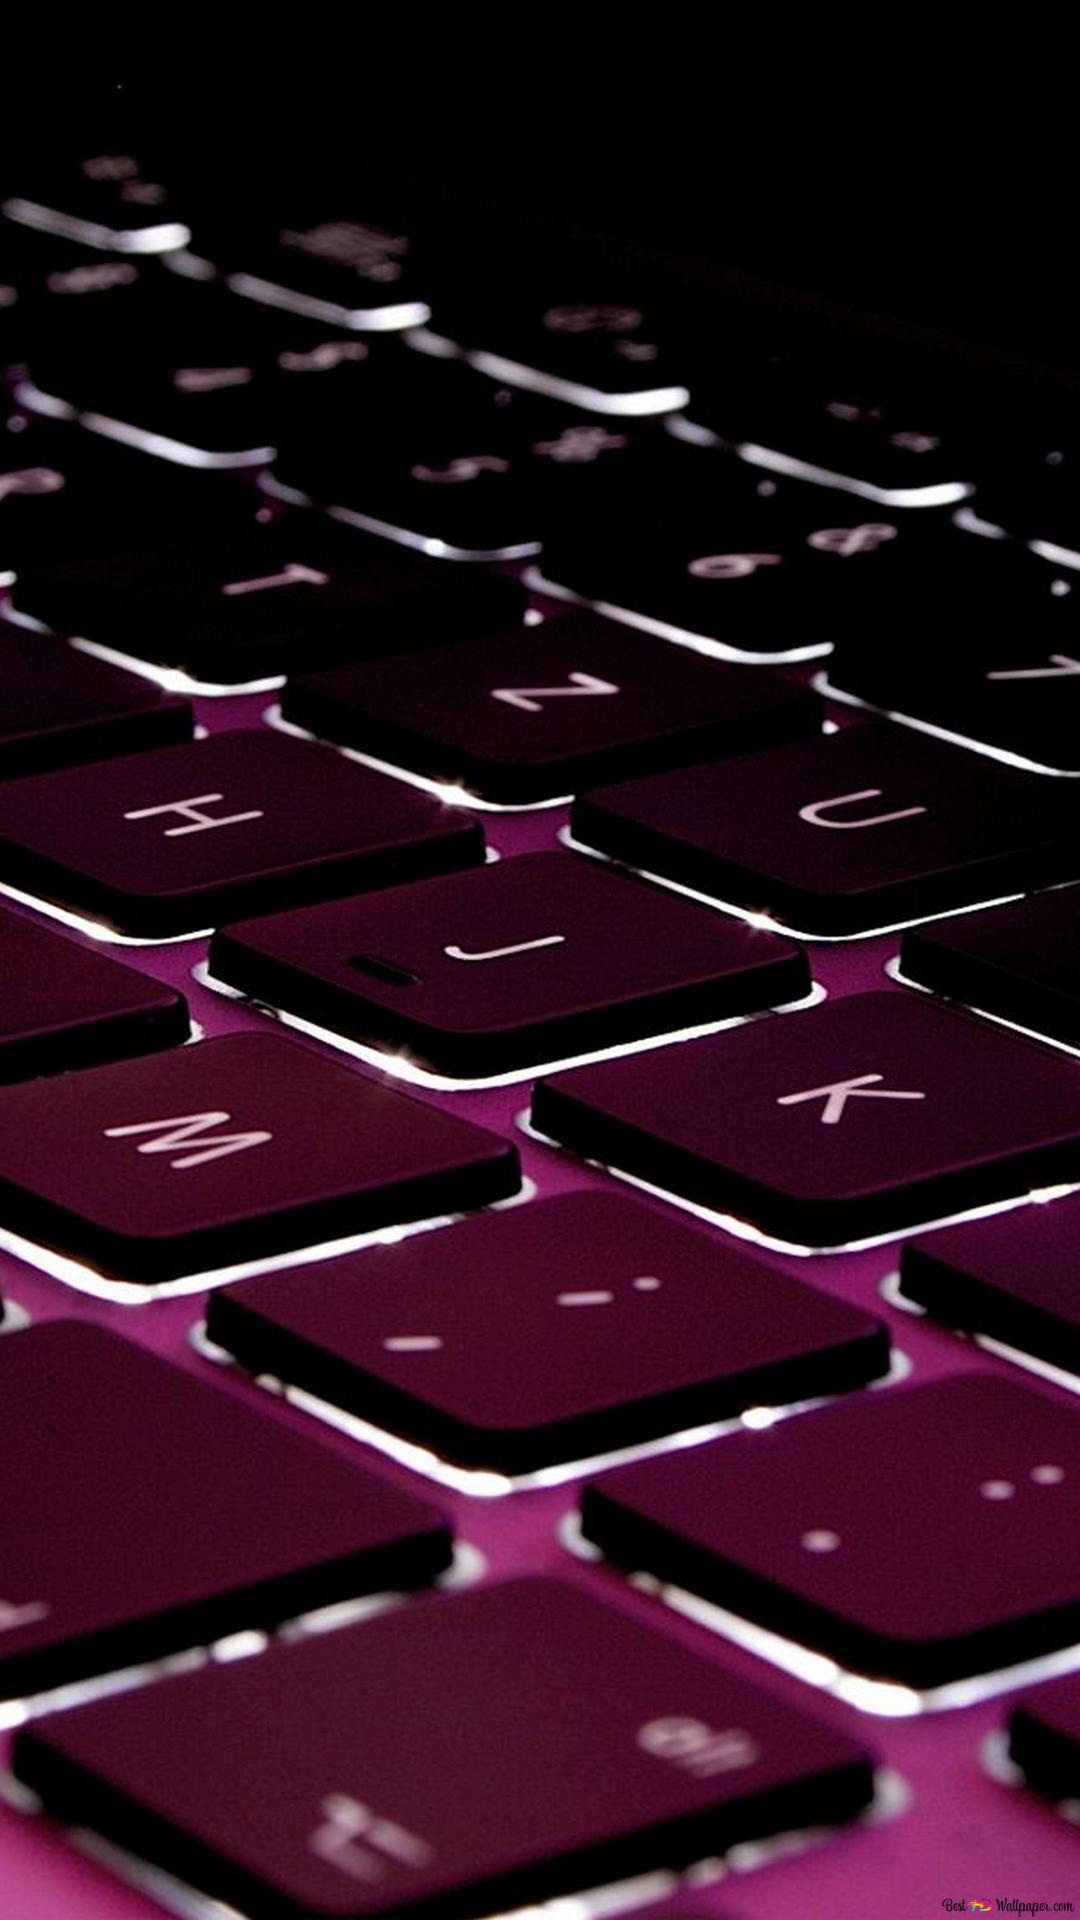 Pink Keyboard Hd Wallpaper Download